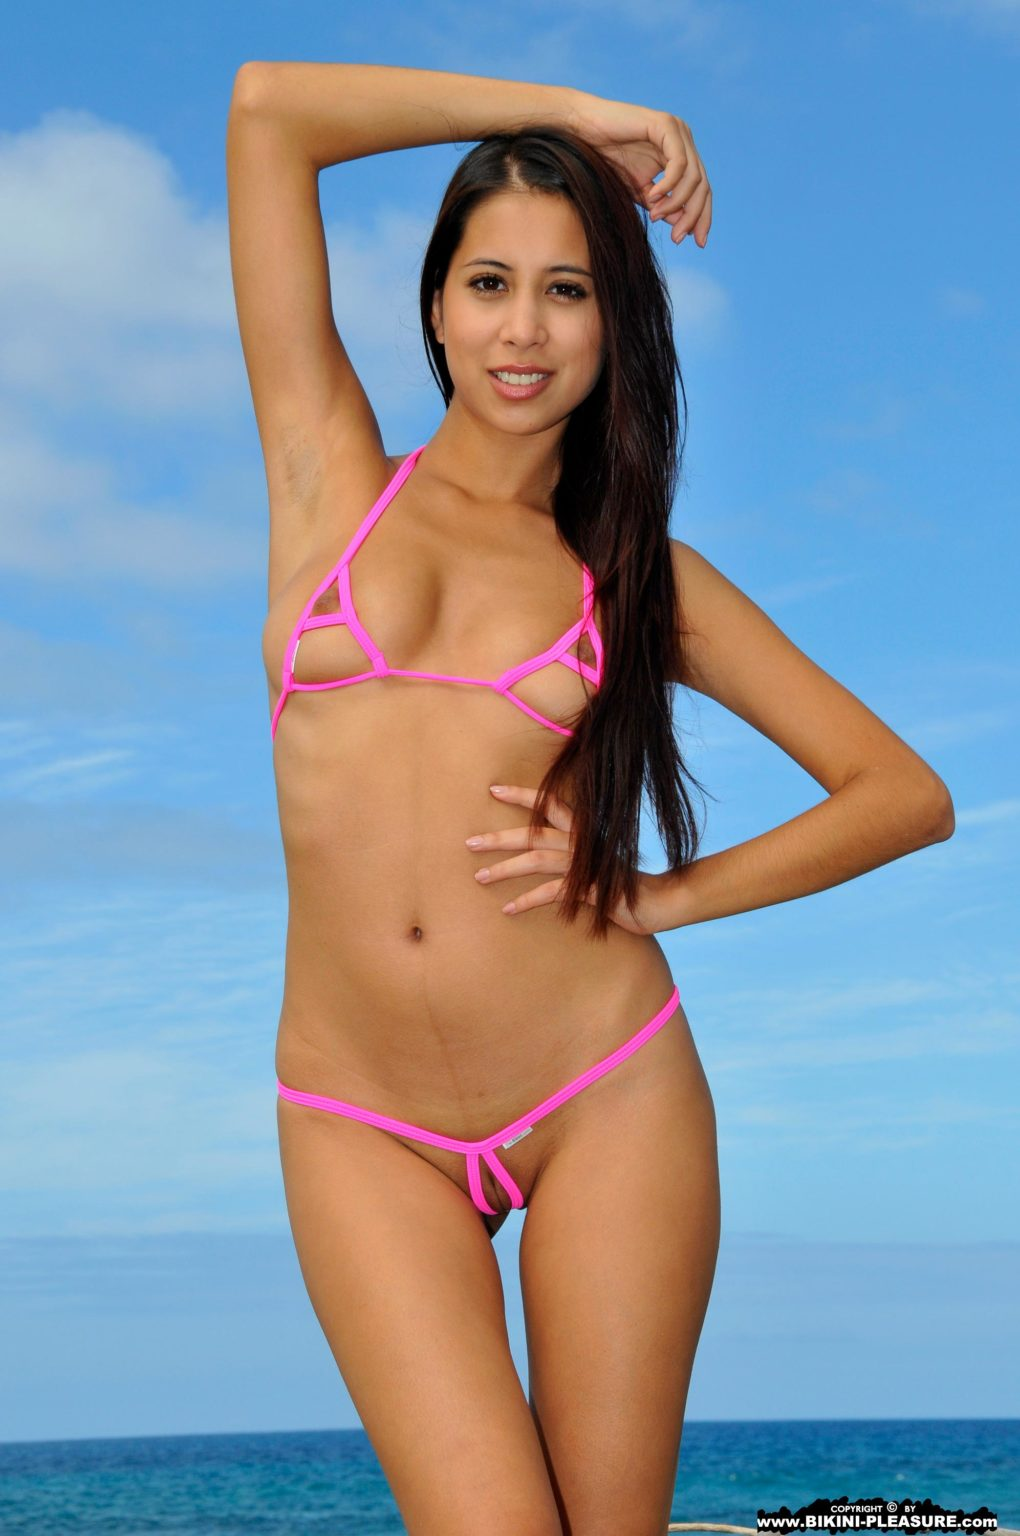 Zaya peekaboo two piece bikini symonekelly